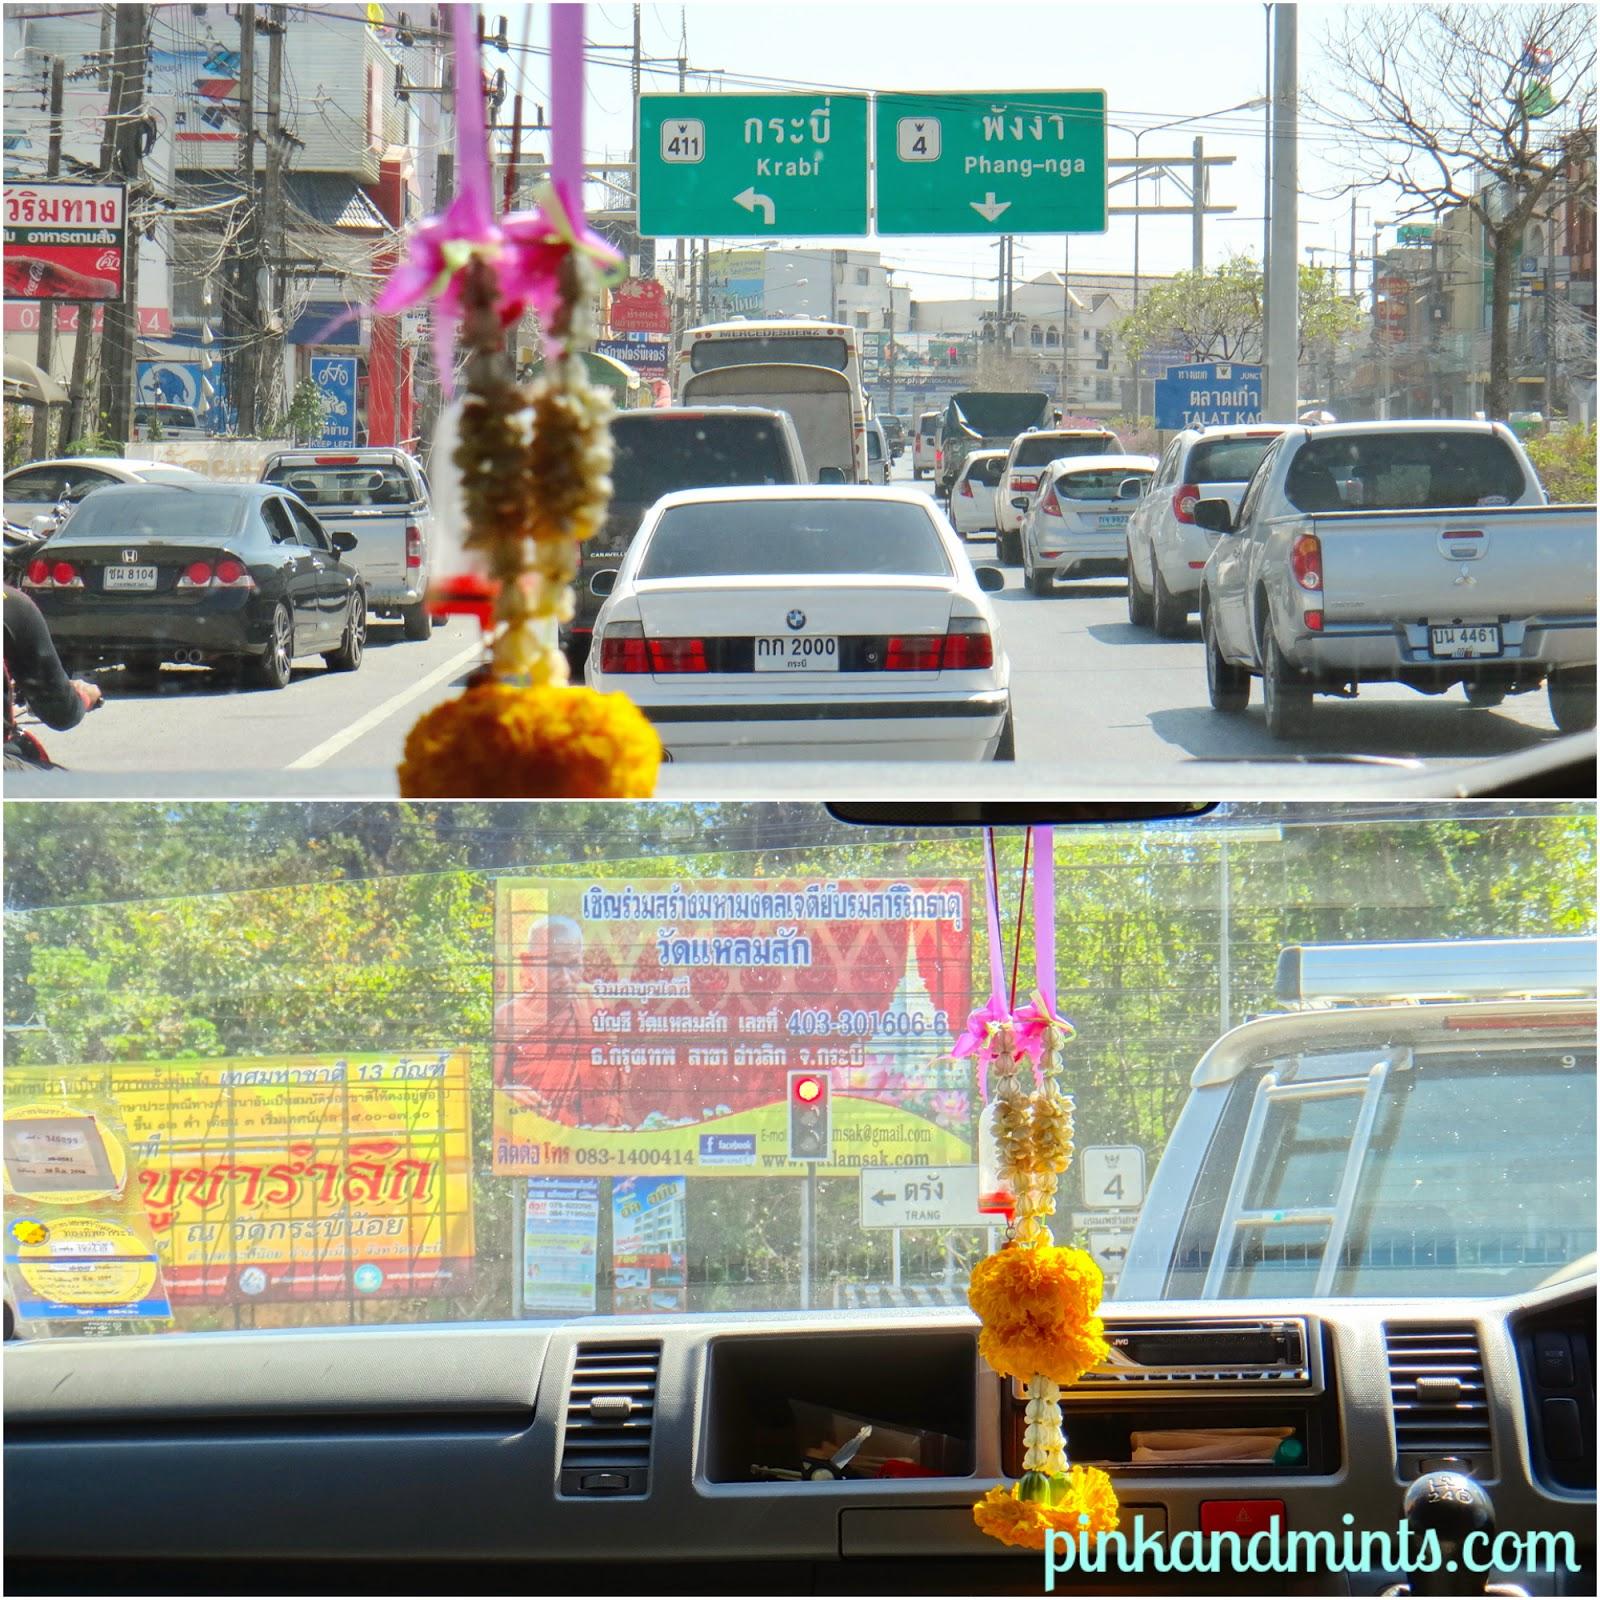 Streets of Krabi